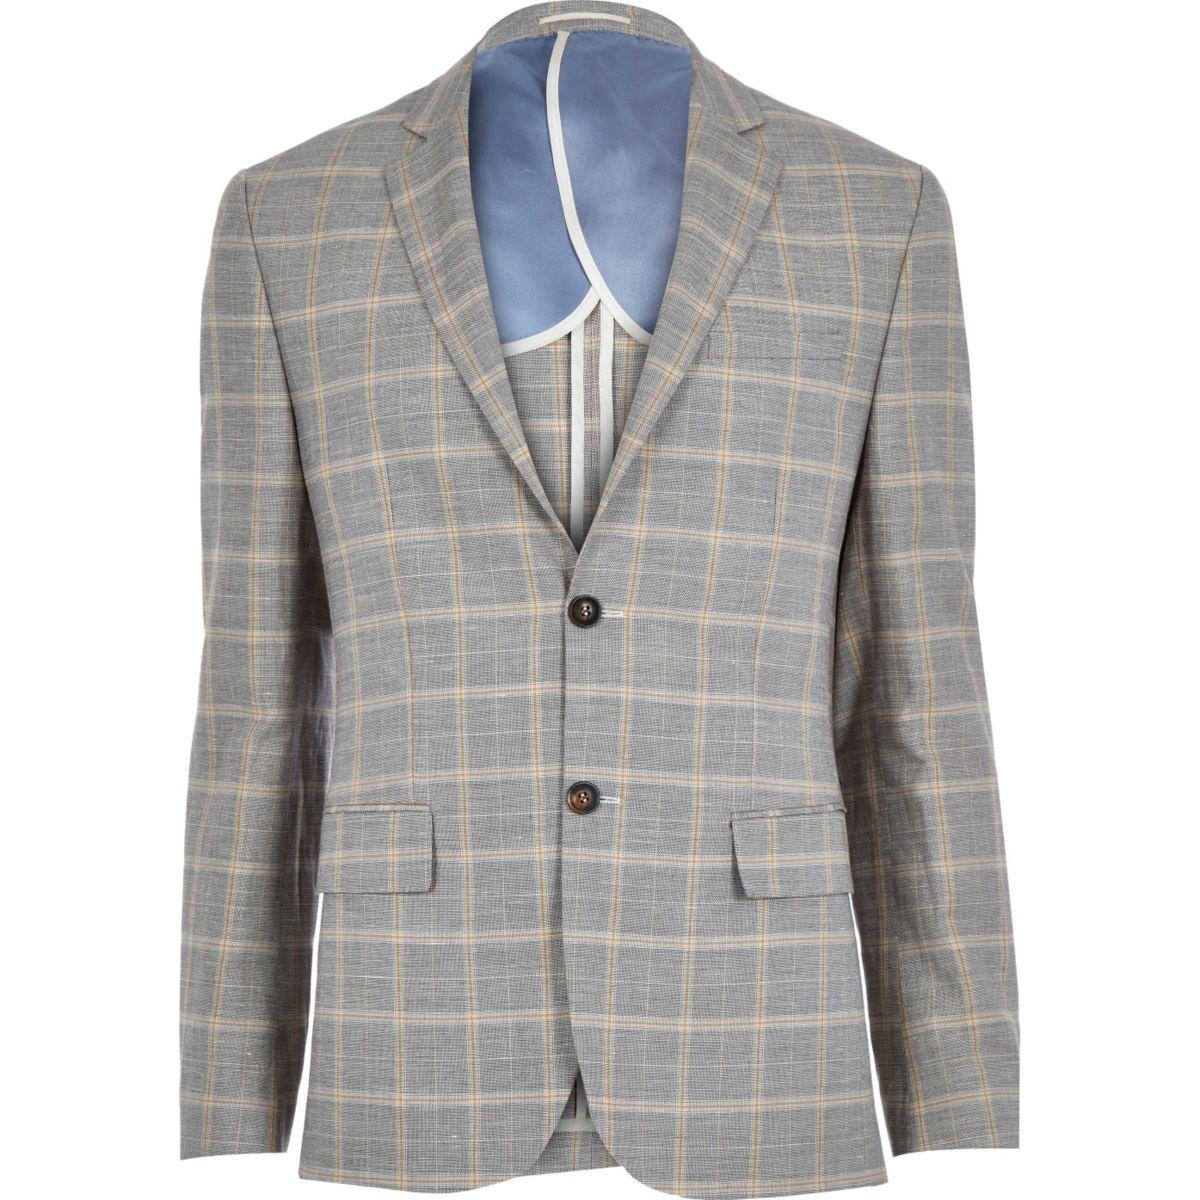 Grey check linen-blend smart suit jacket